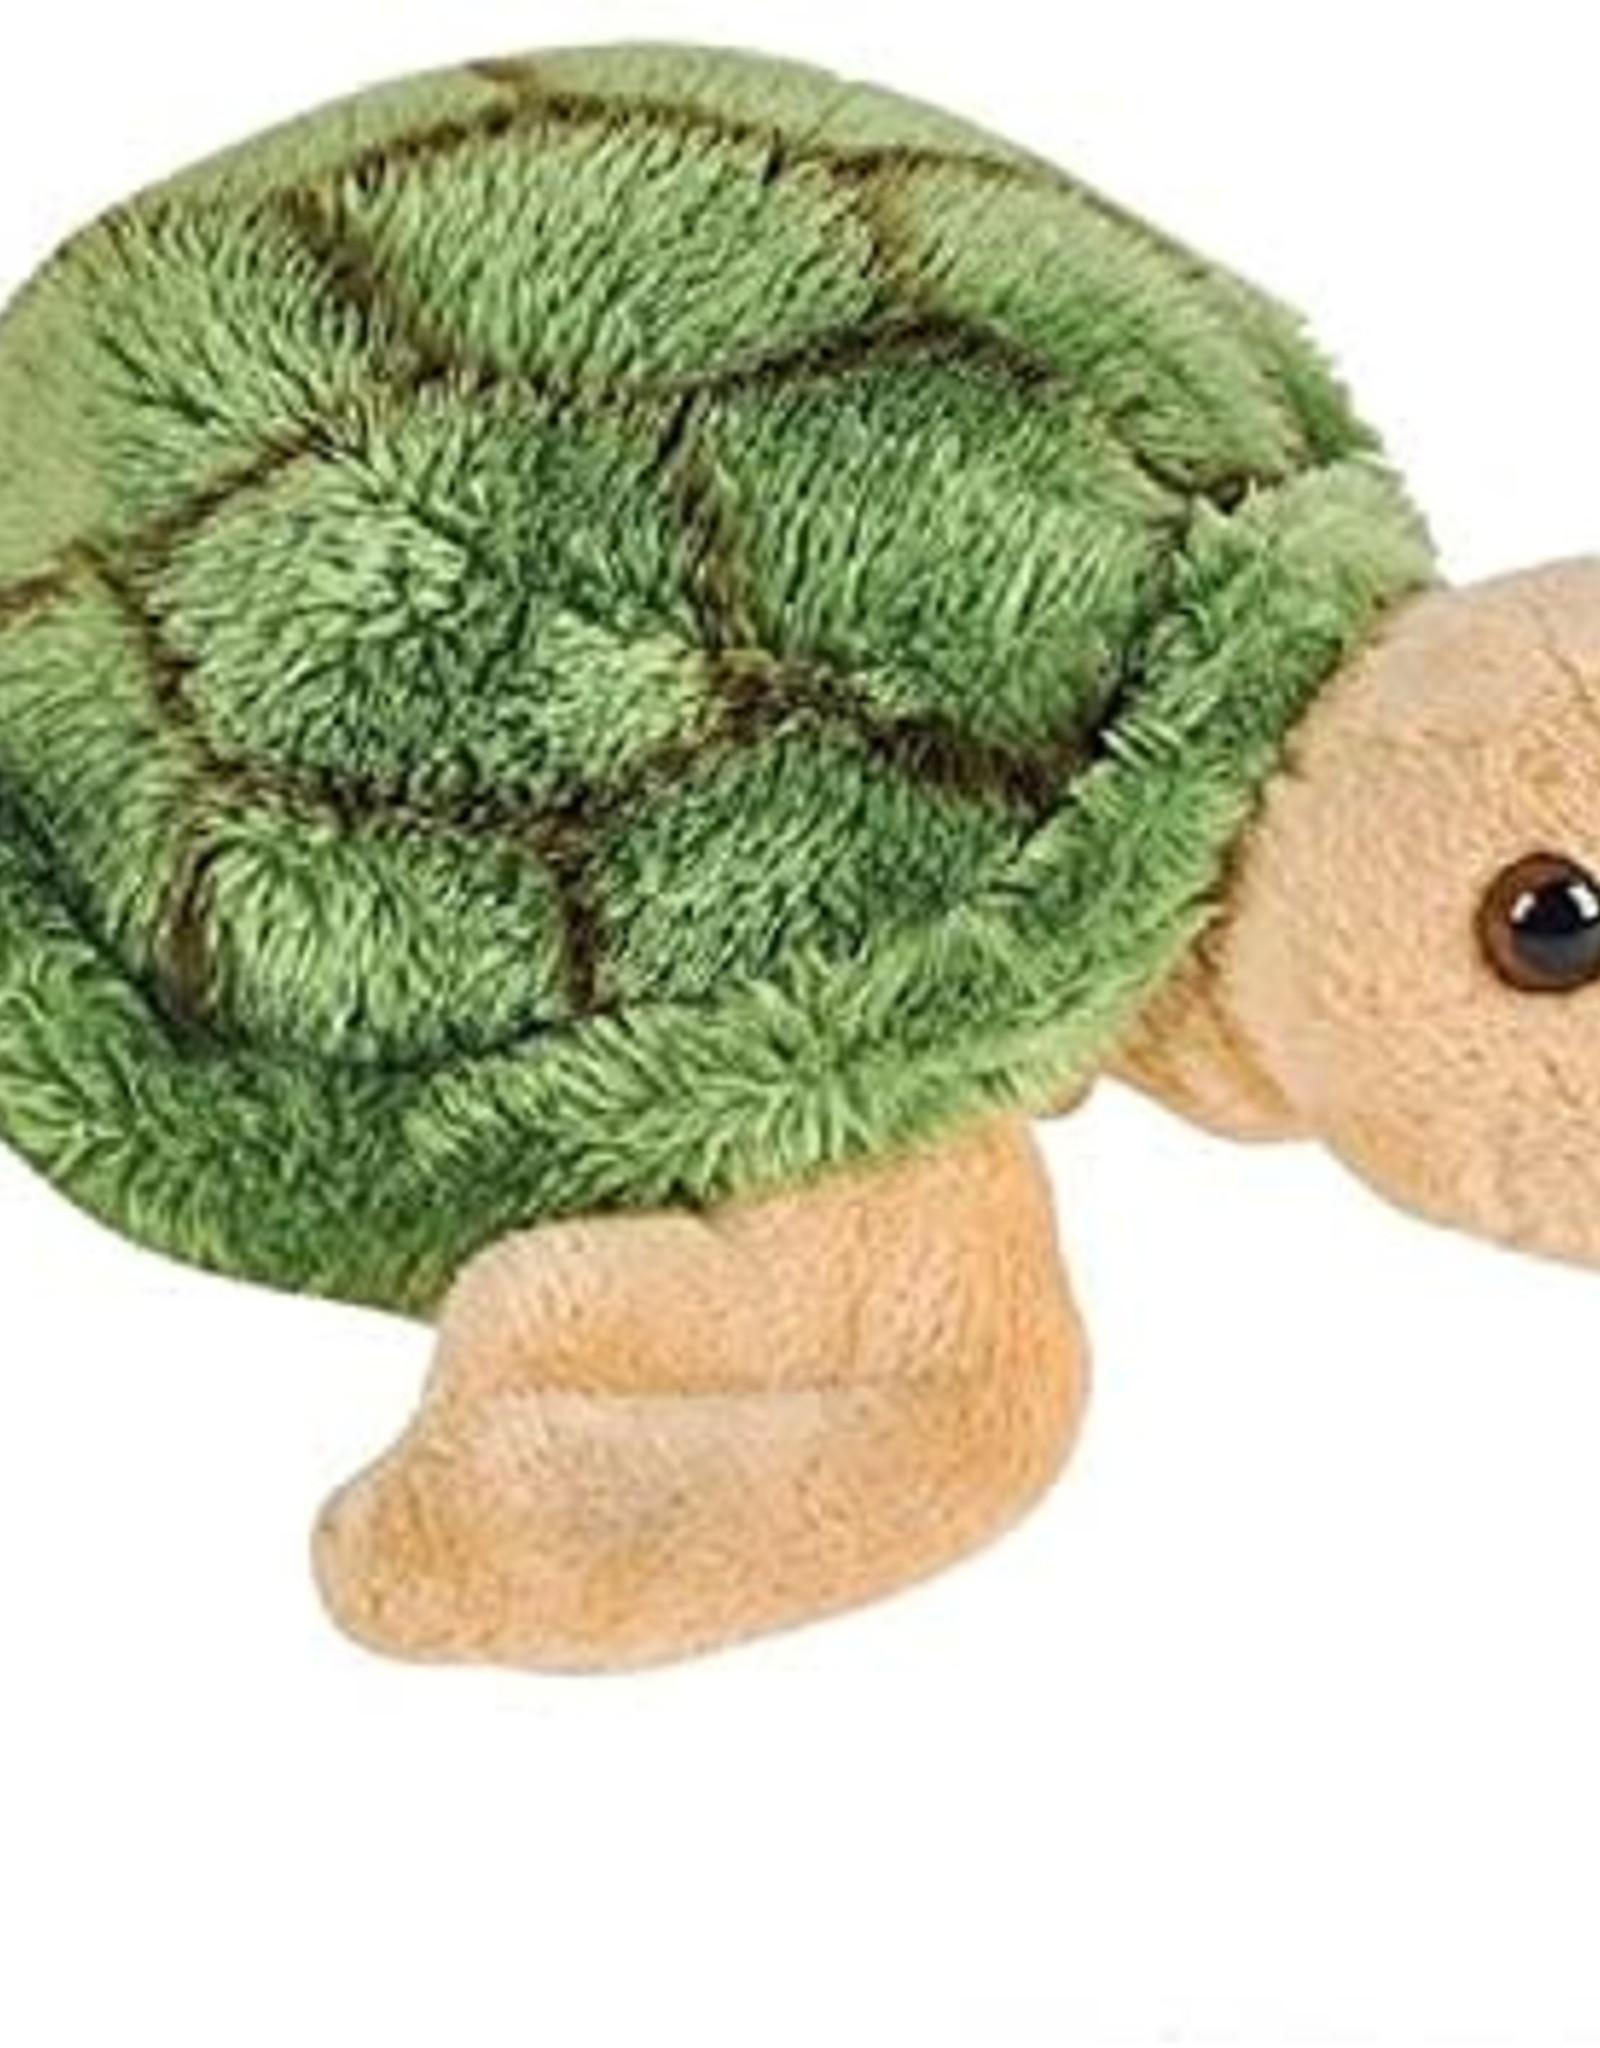 Small World Turtle